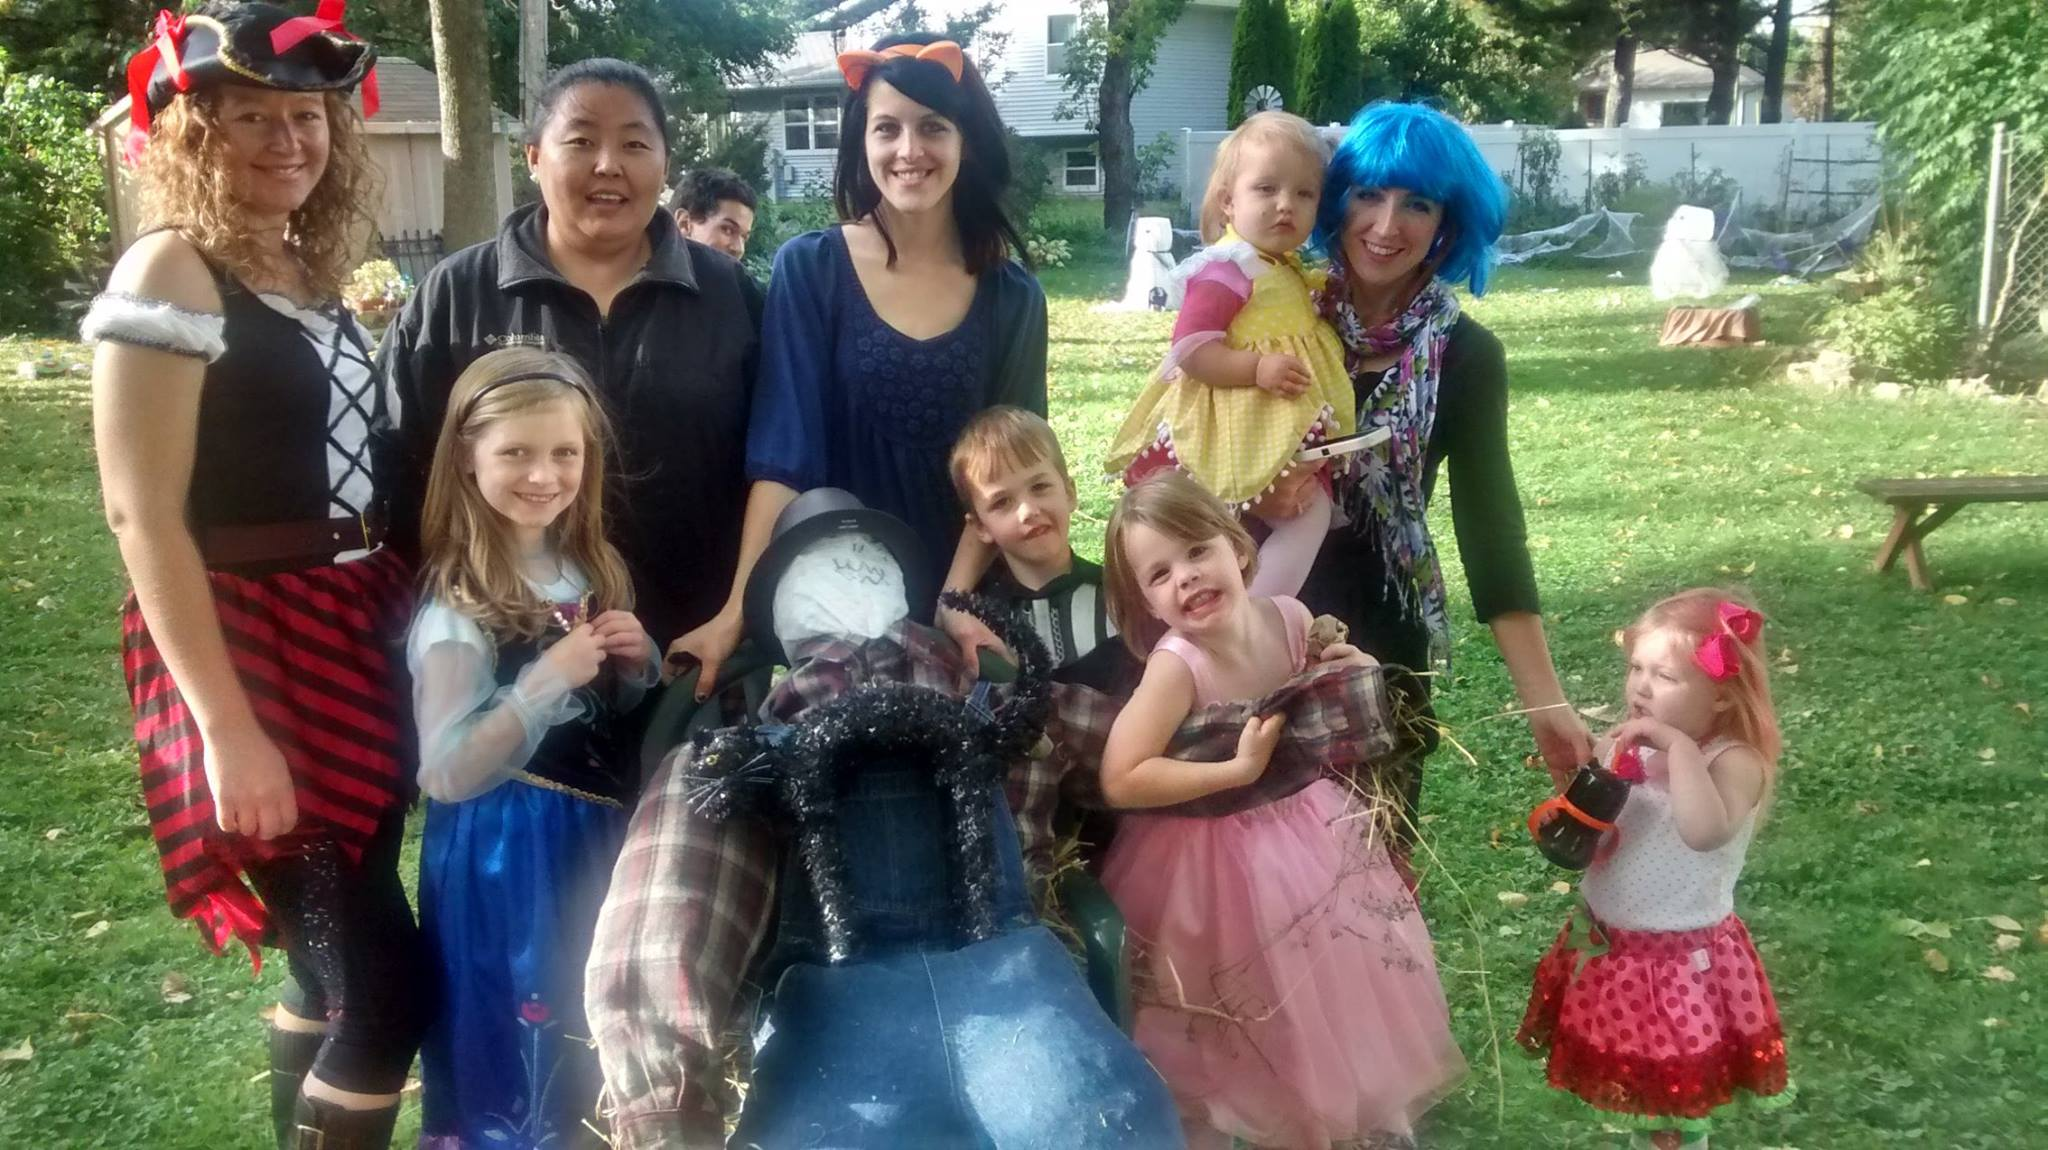 Fall festival scarecrow building contest